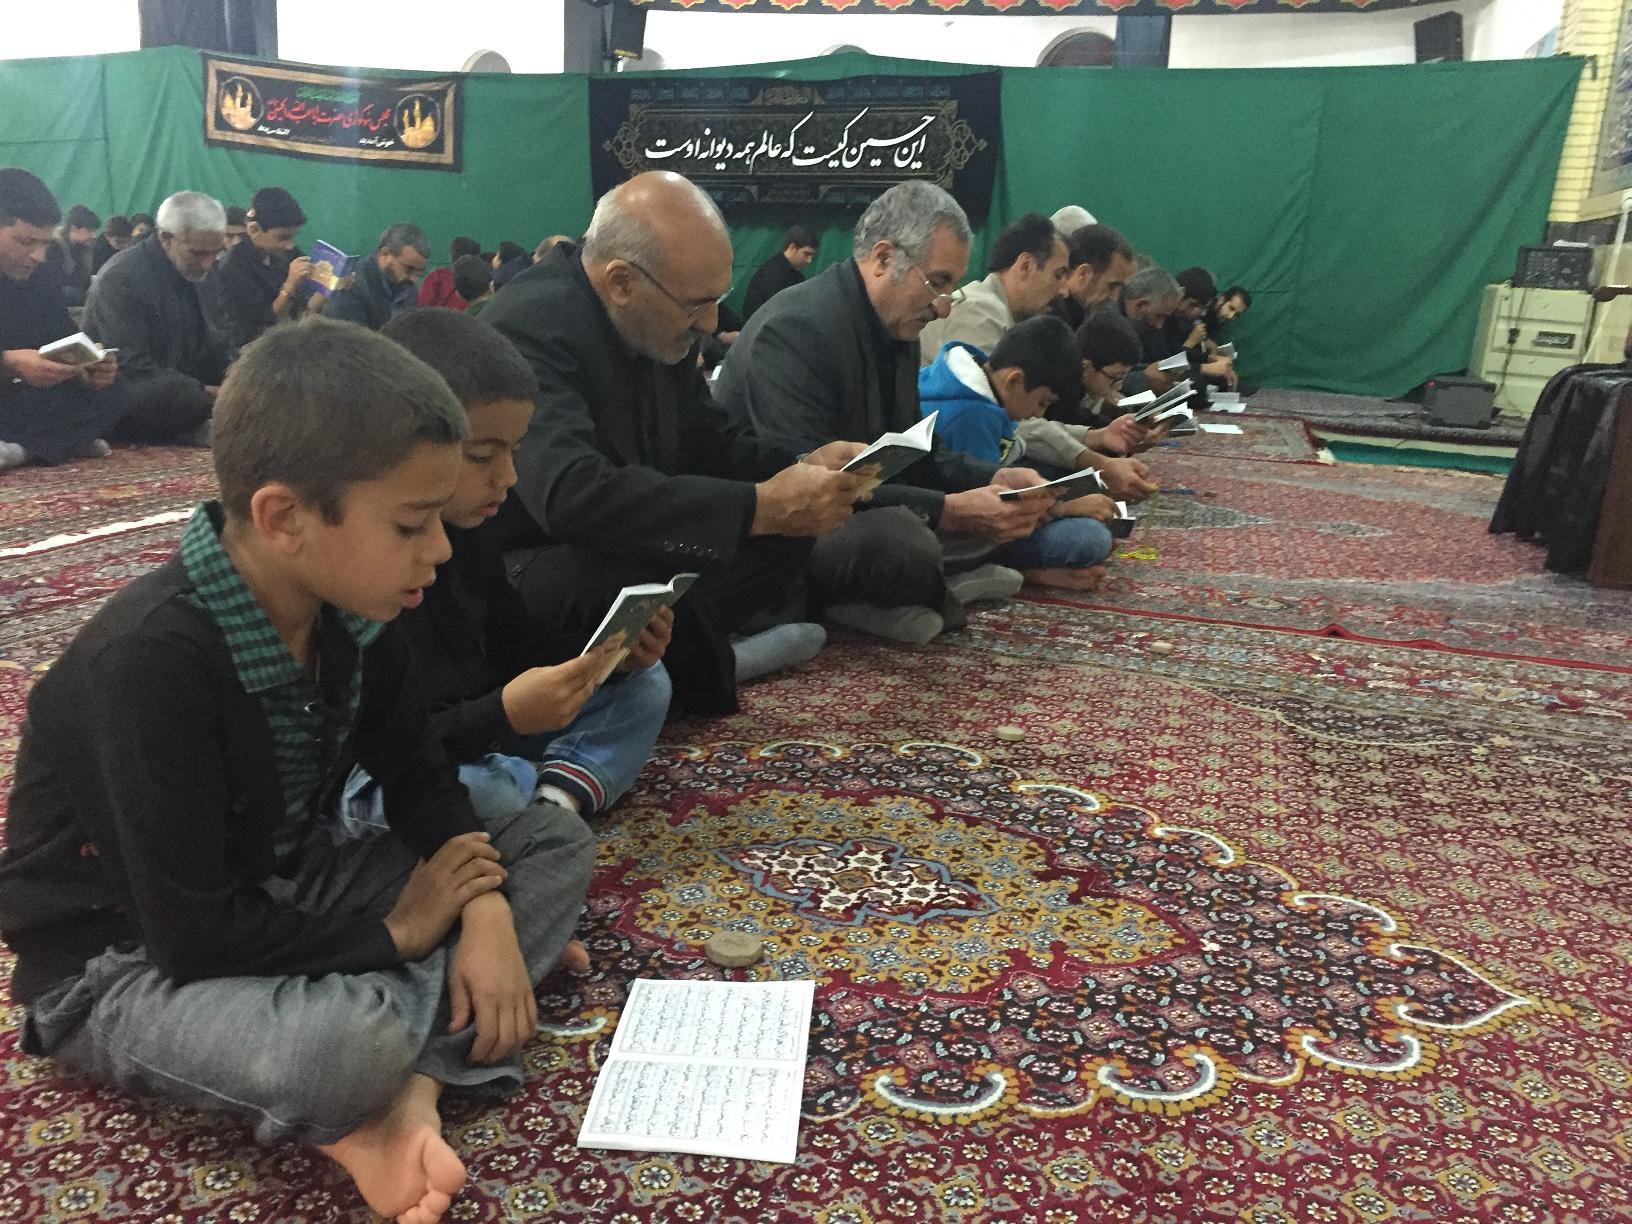 مسجد امام سجاد(ع) بيجار